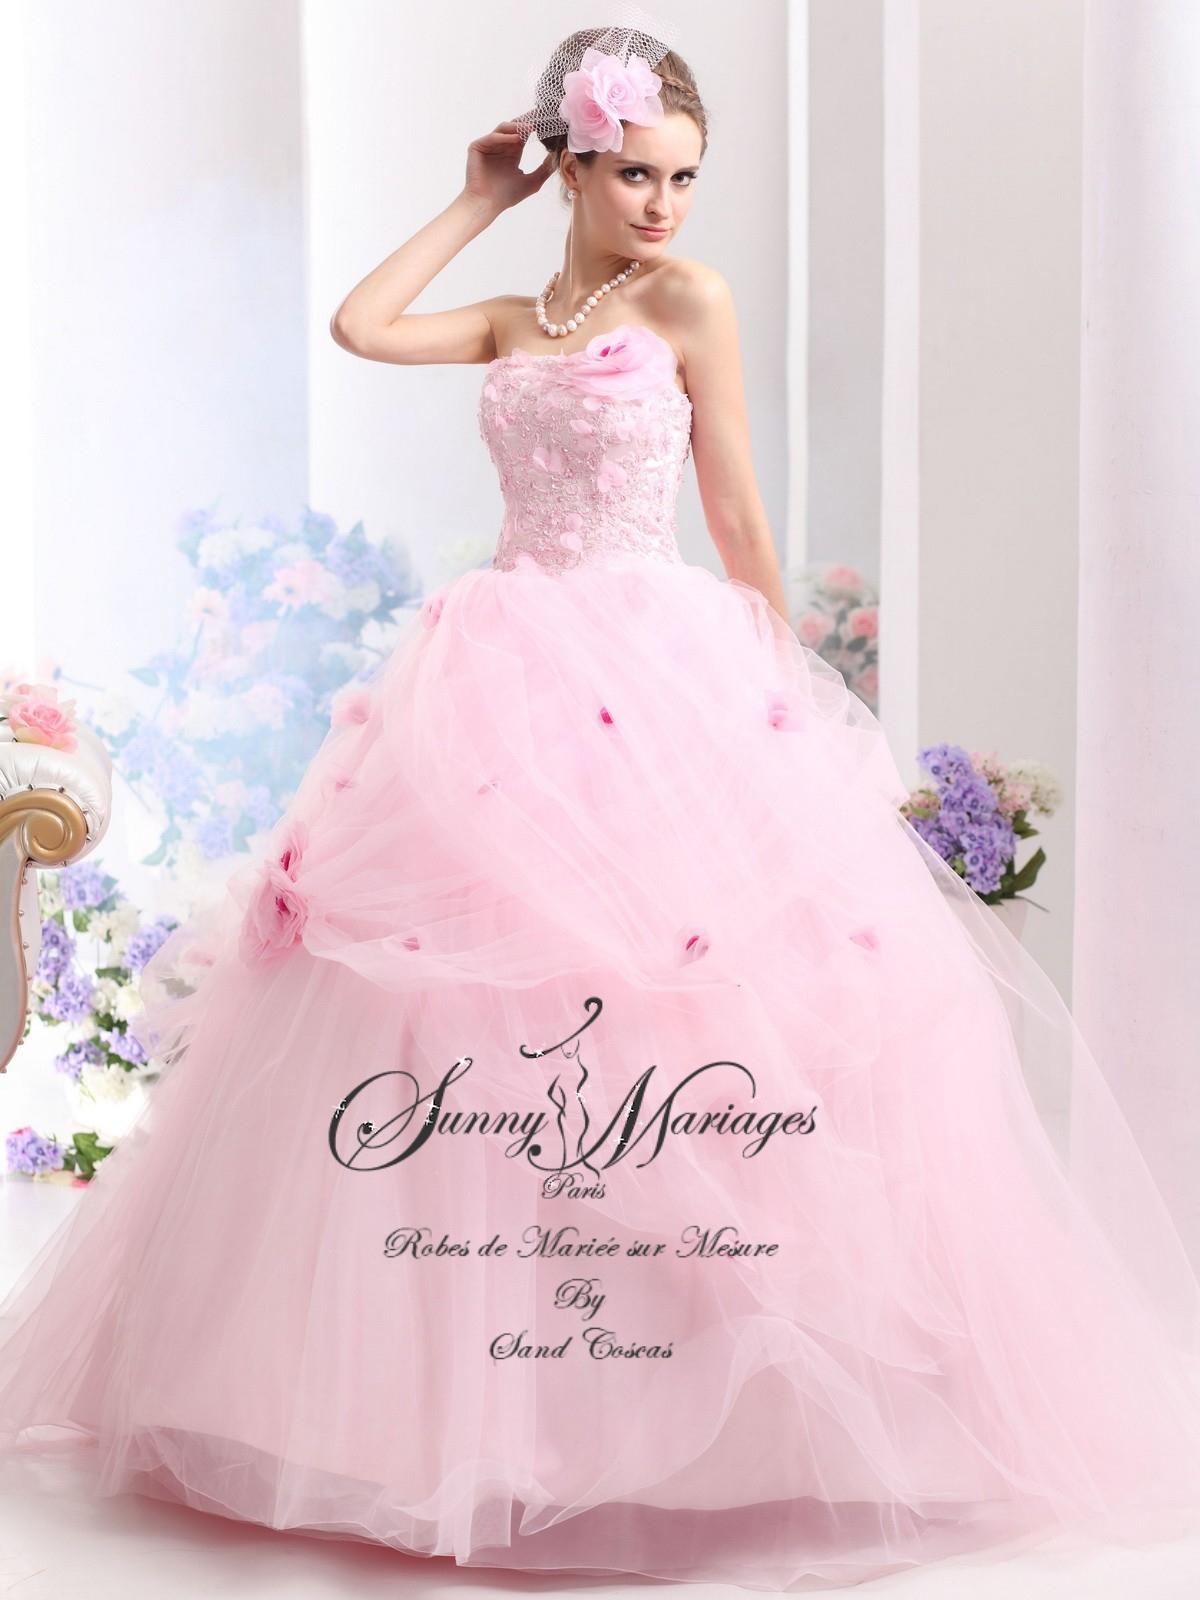 Robe De Mariée Princesse Couleur Rose Sunny Mariage